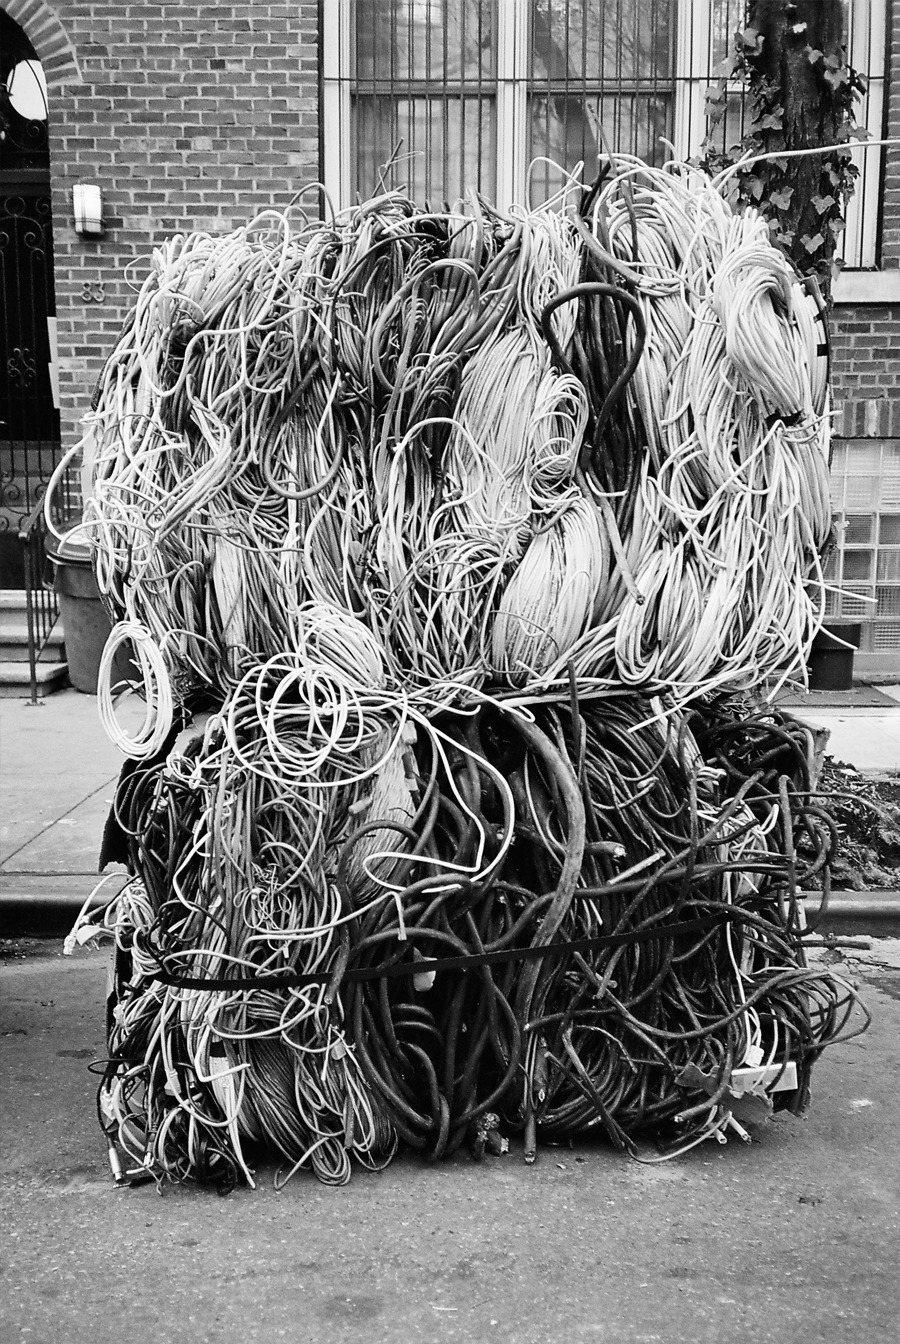 the-tree-mag-photos-by-christian-neuenschwander-210.jpg